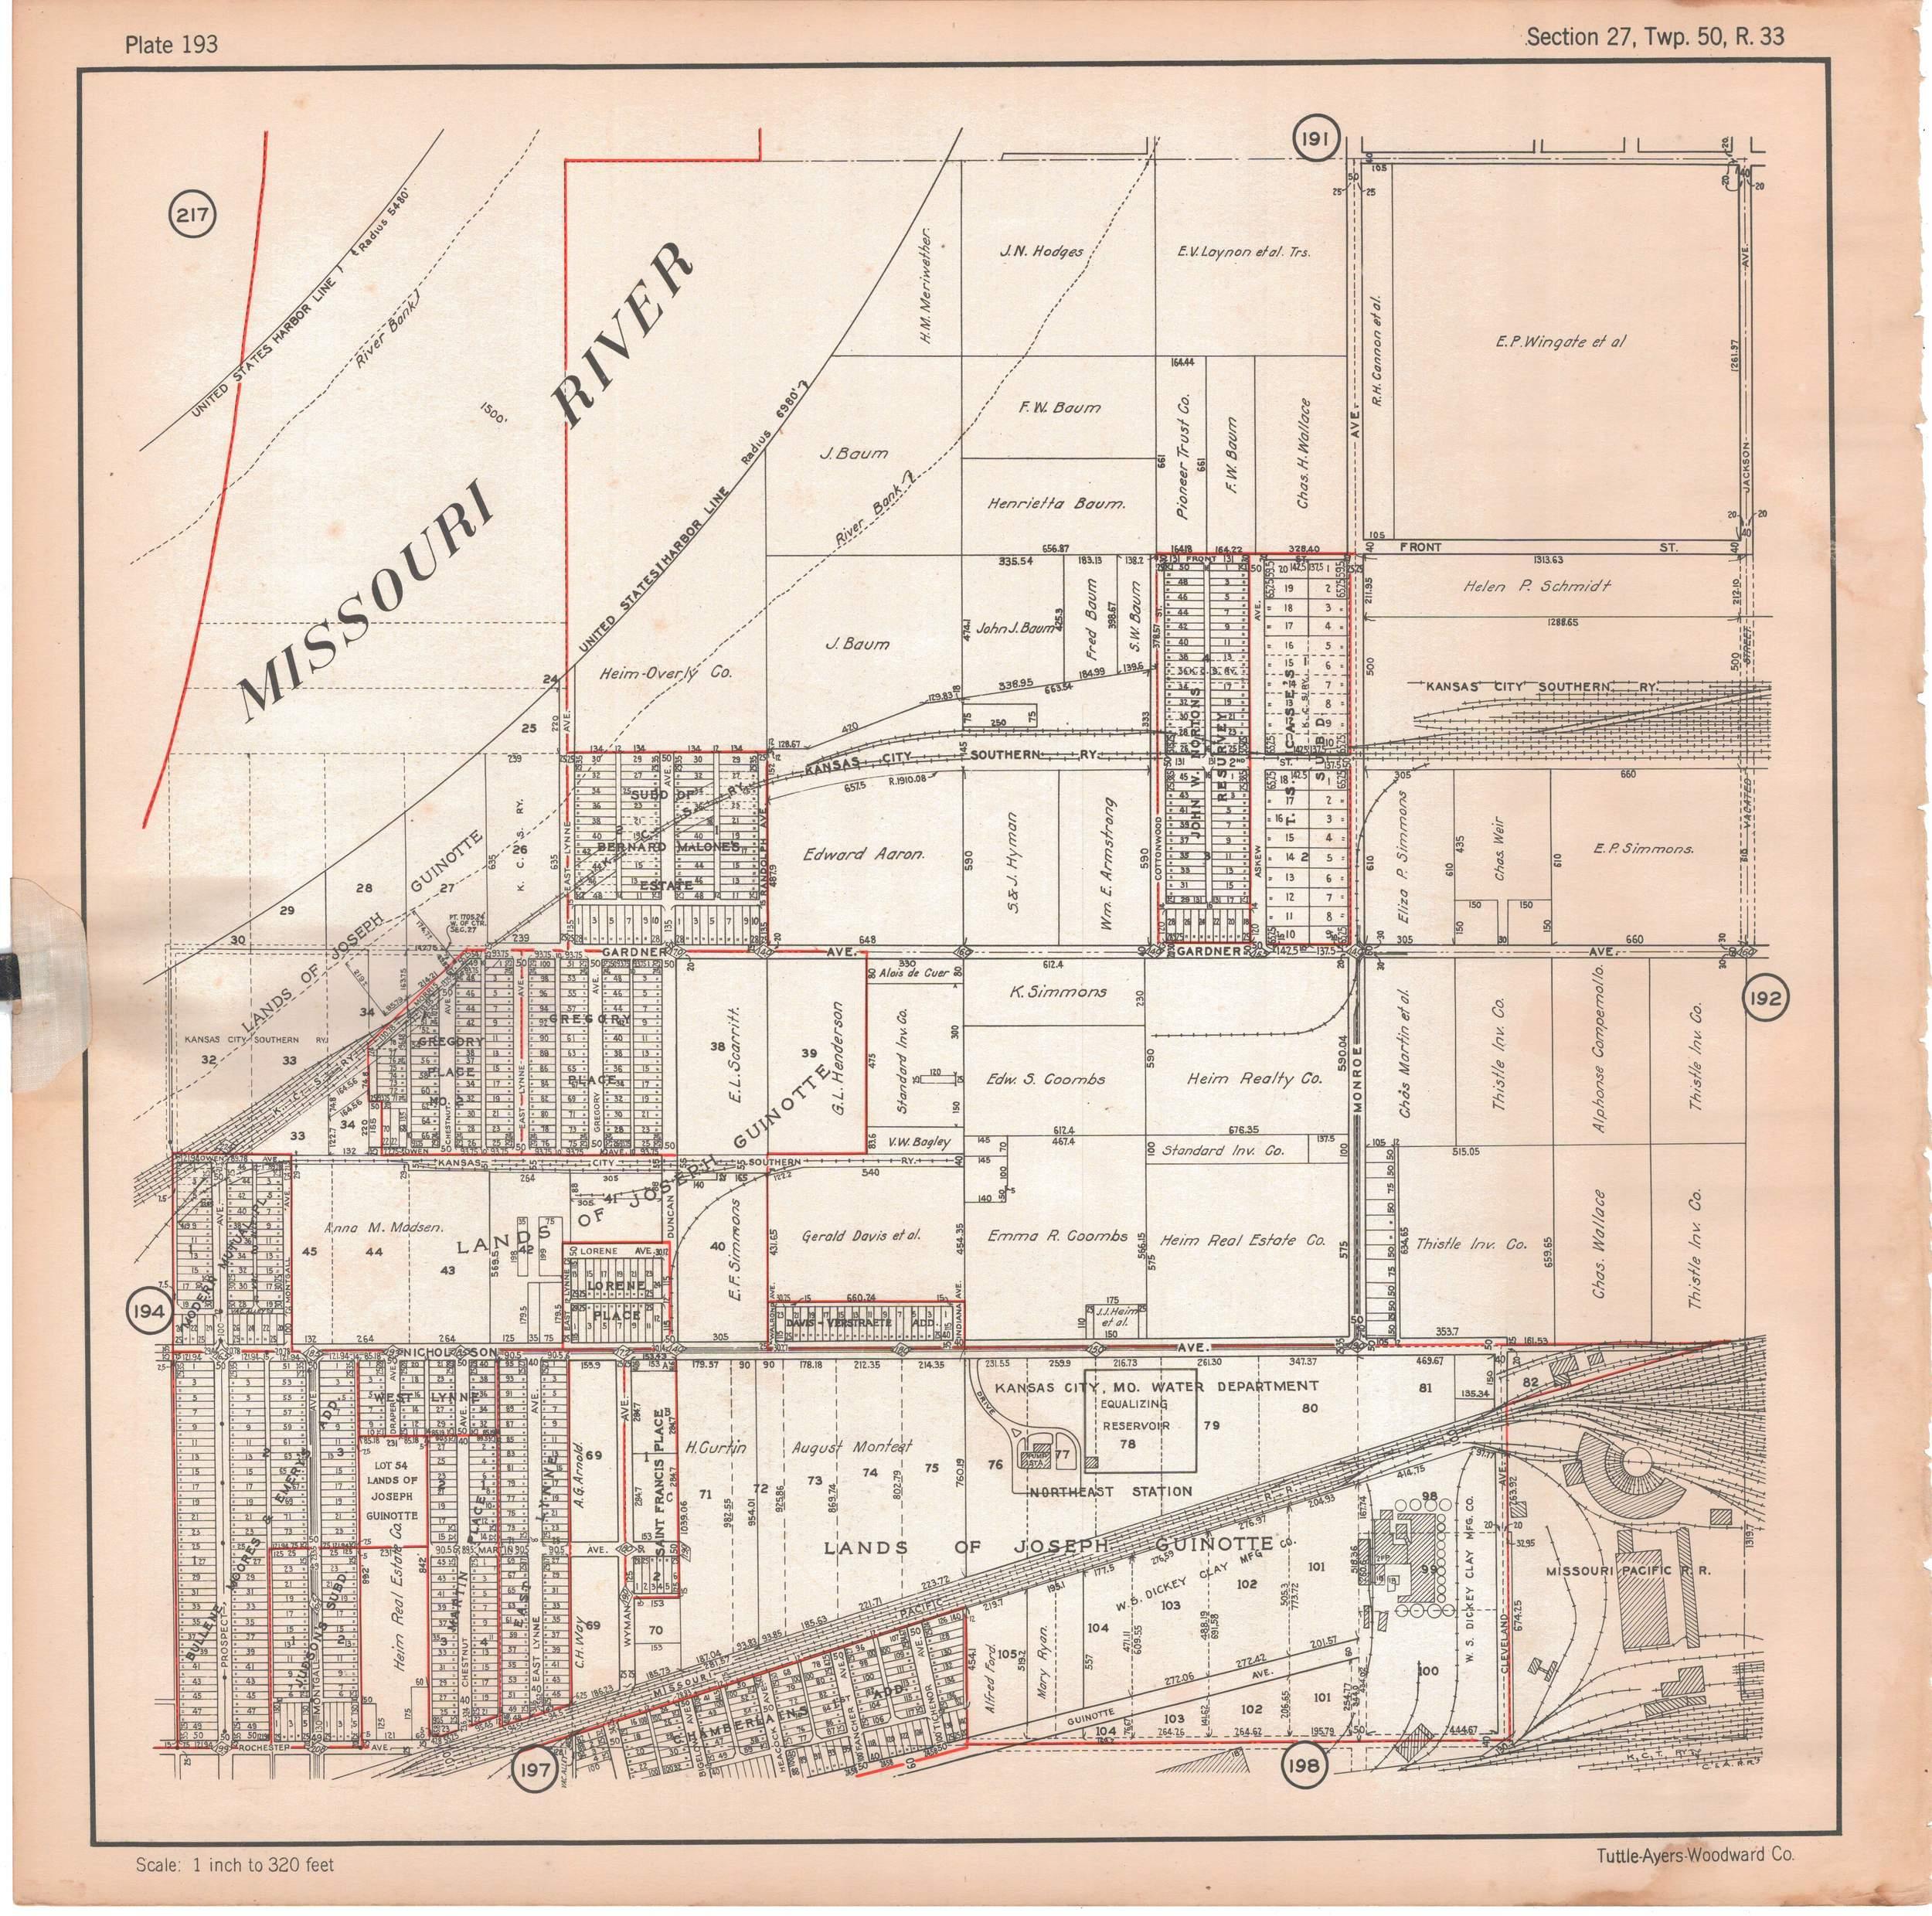 1925 TUTTLE_AYERS_Plate_193.JPG